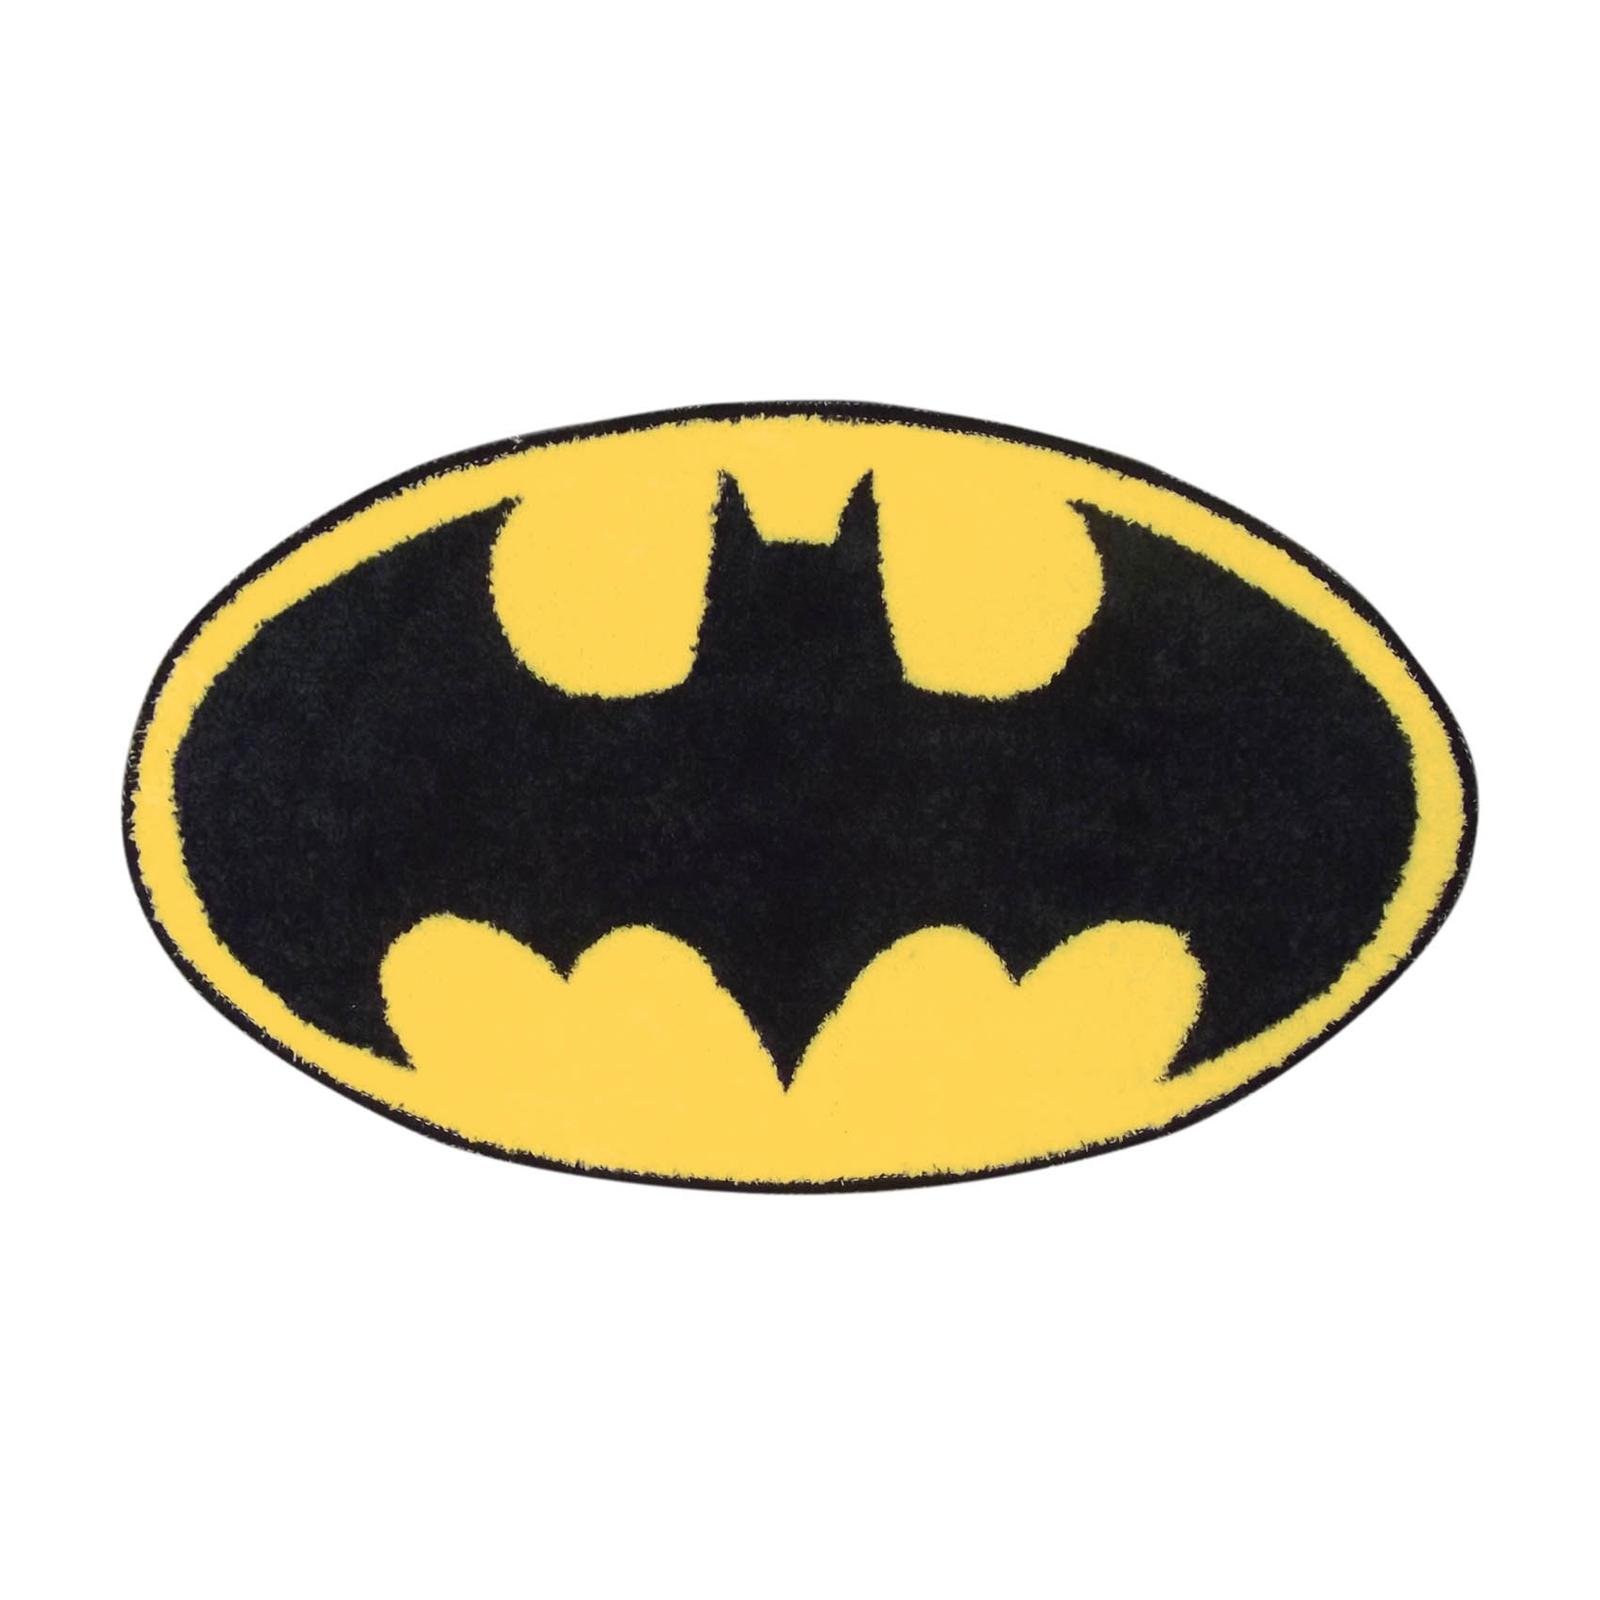 Batman Bathroom Sign: NEW BATMAN LOGO BATHROOM MAT NON SLIP WASHABLE SHOWER